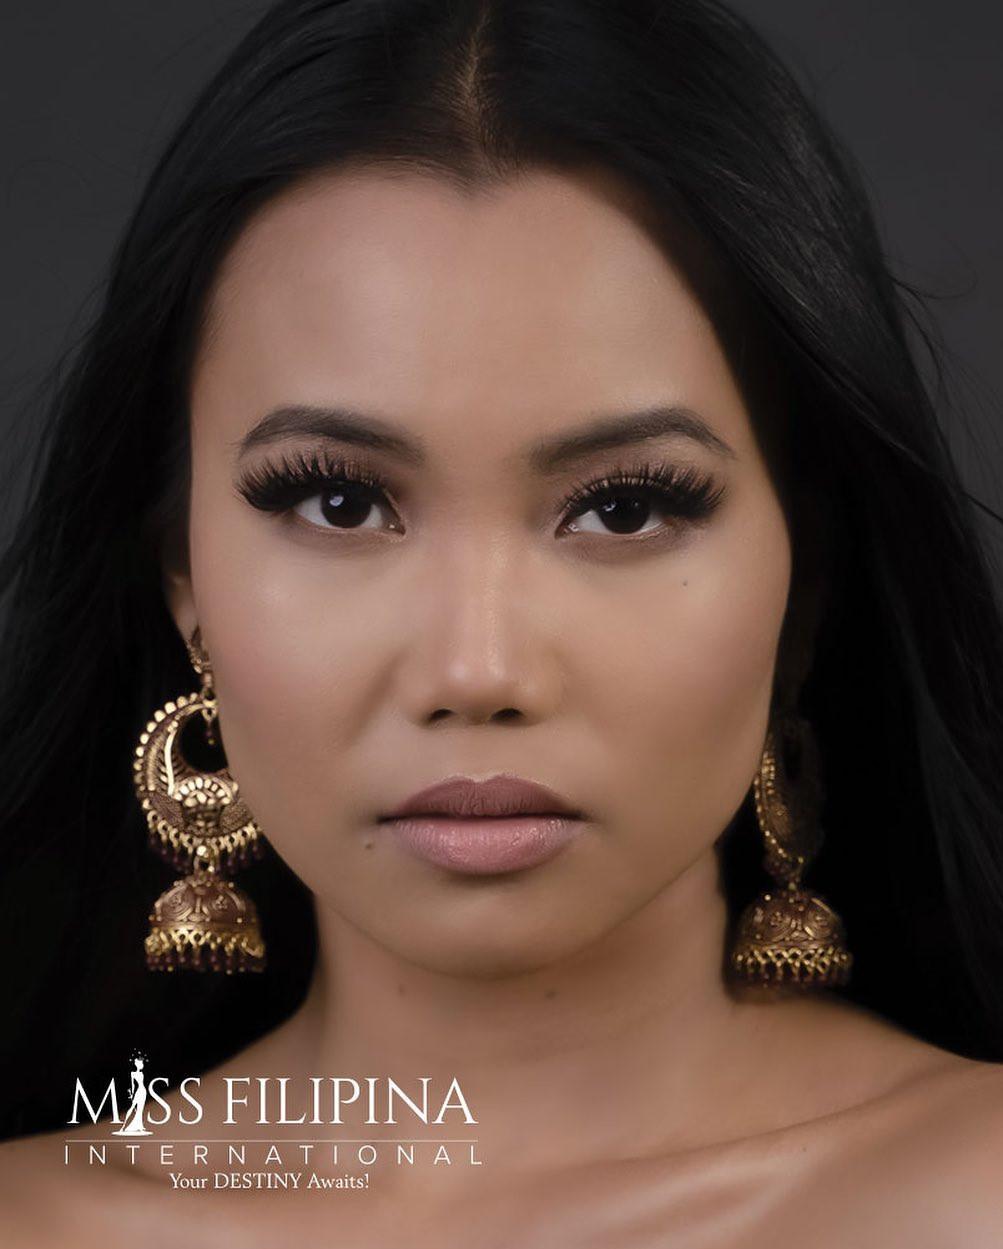 candidatas a miss filipina international 2021. final: 31 july. - Página 2 A5feSa